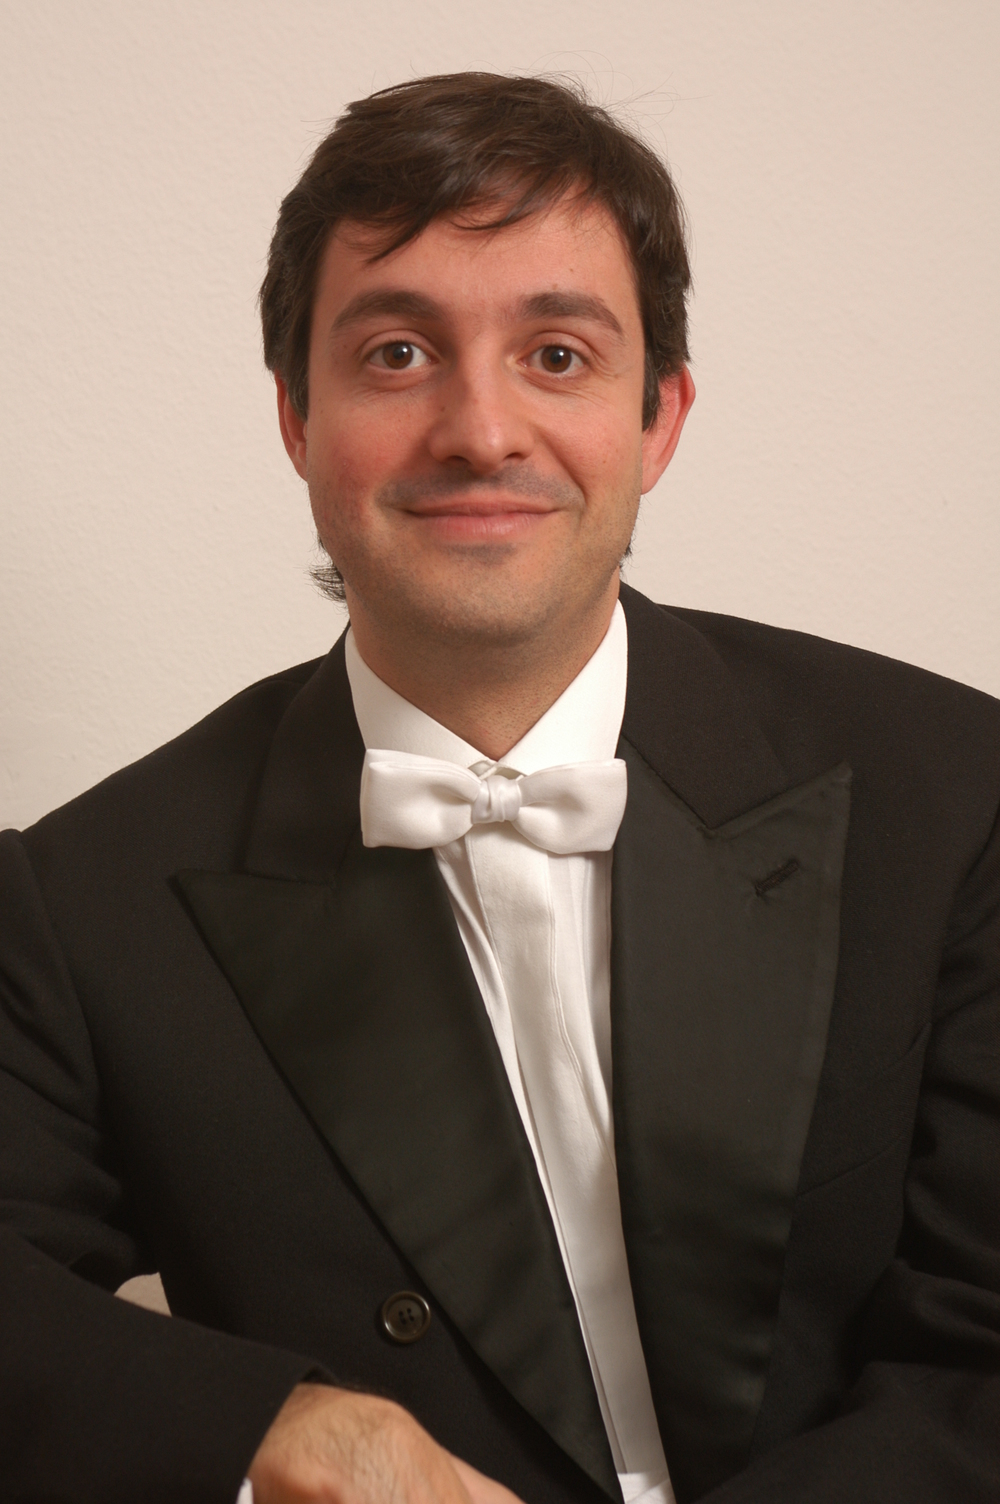 Jordi Molina Davila - Tenor